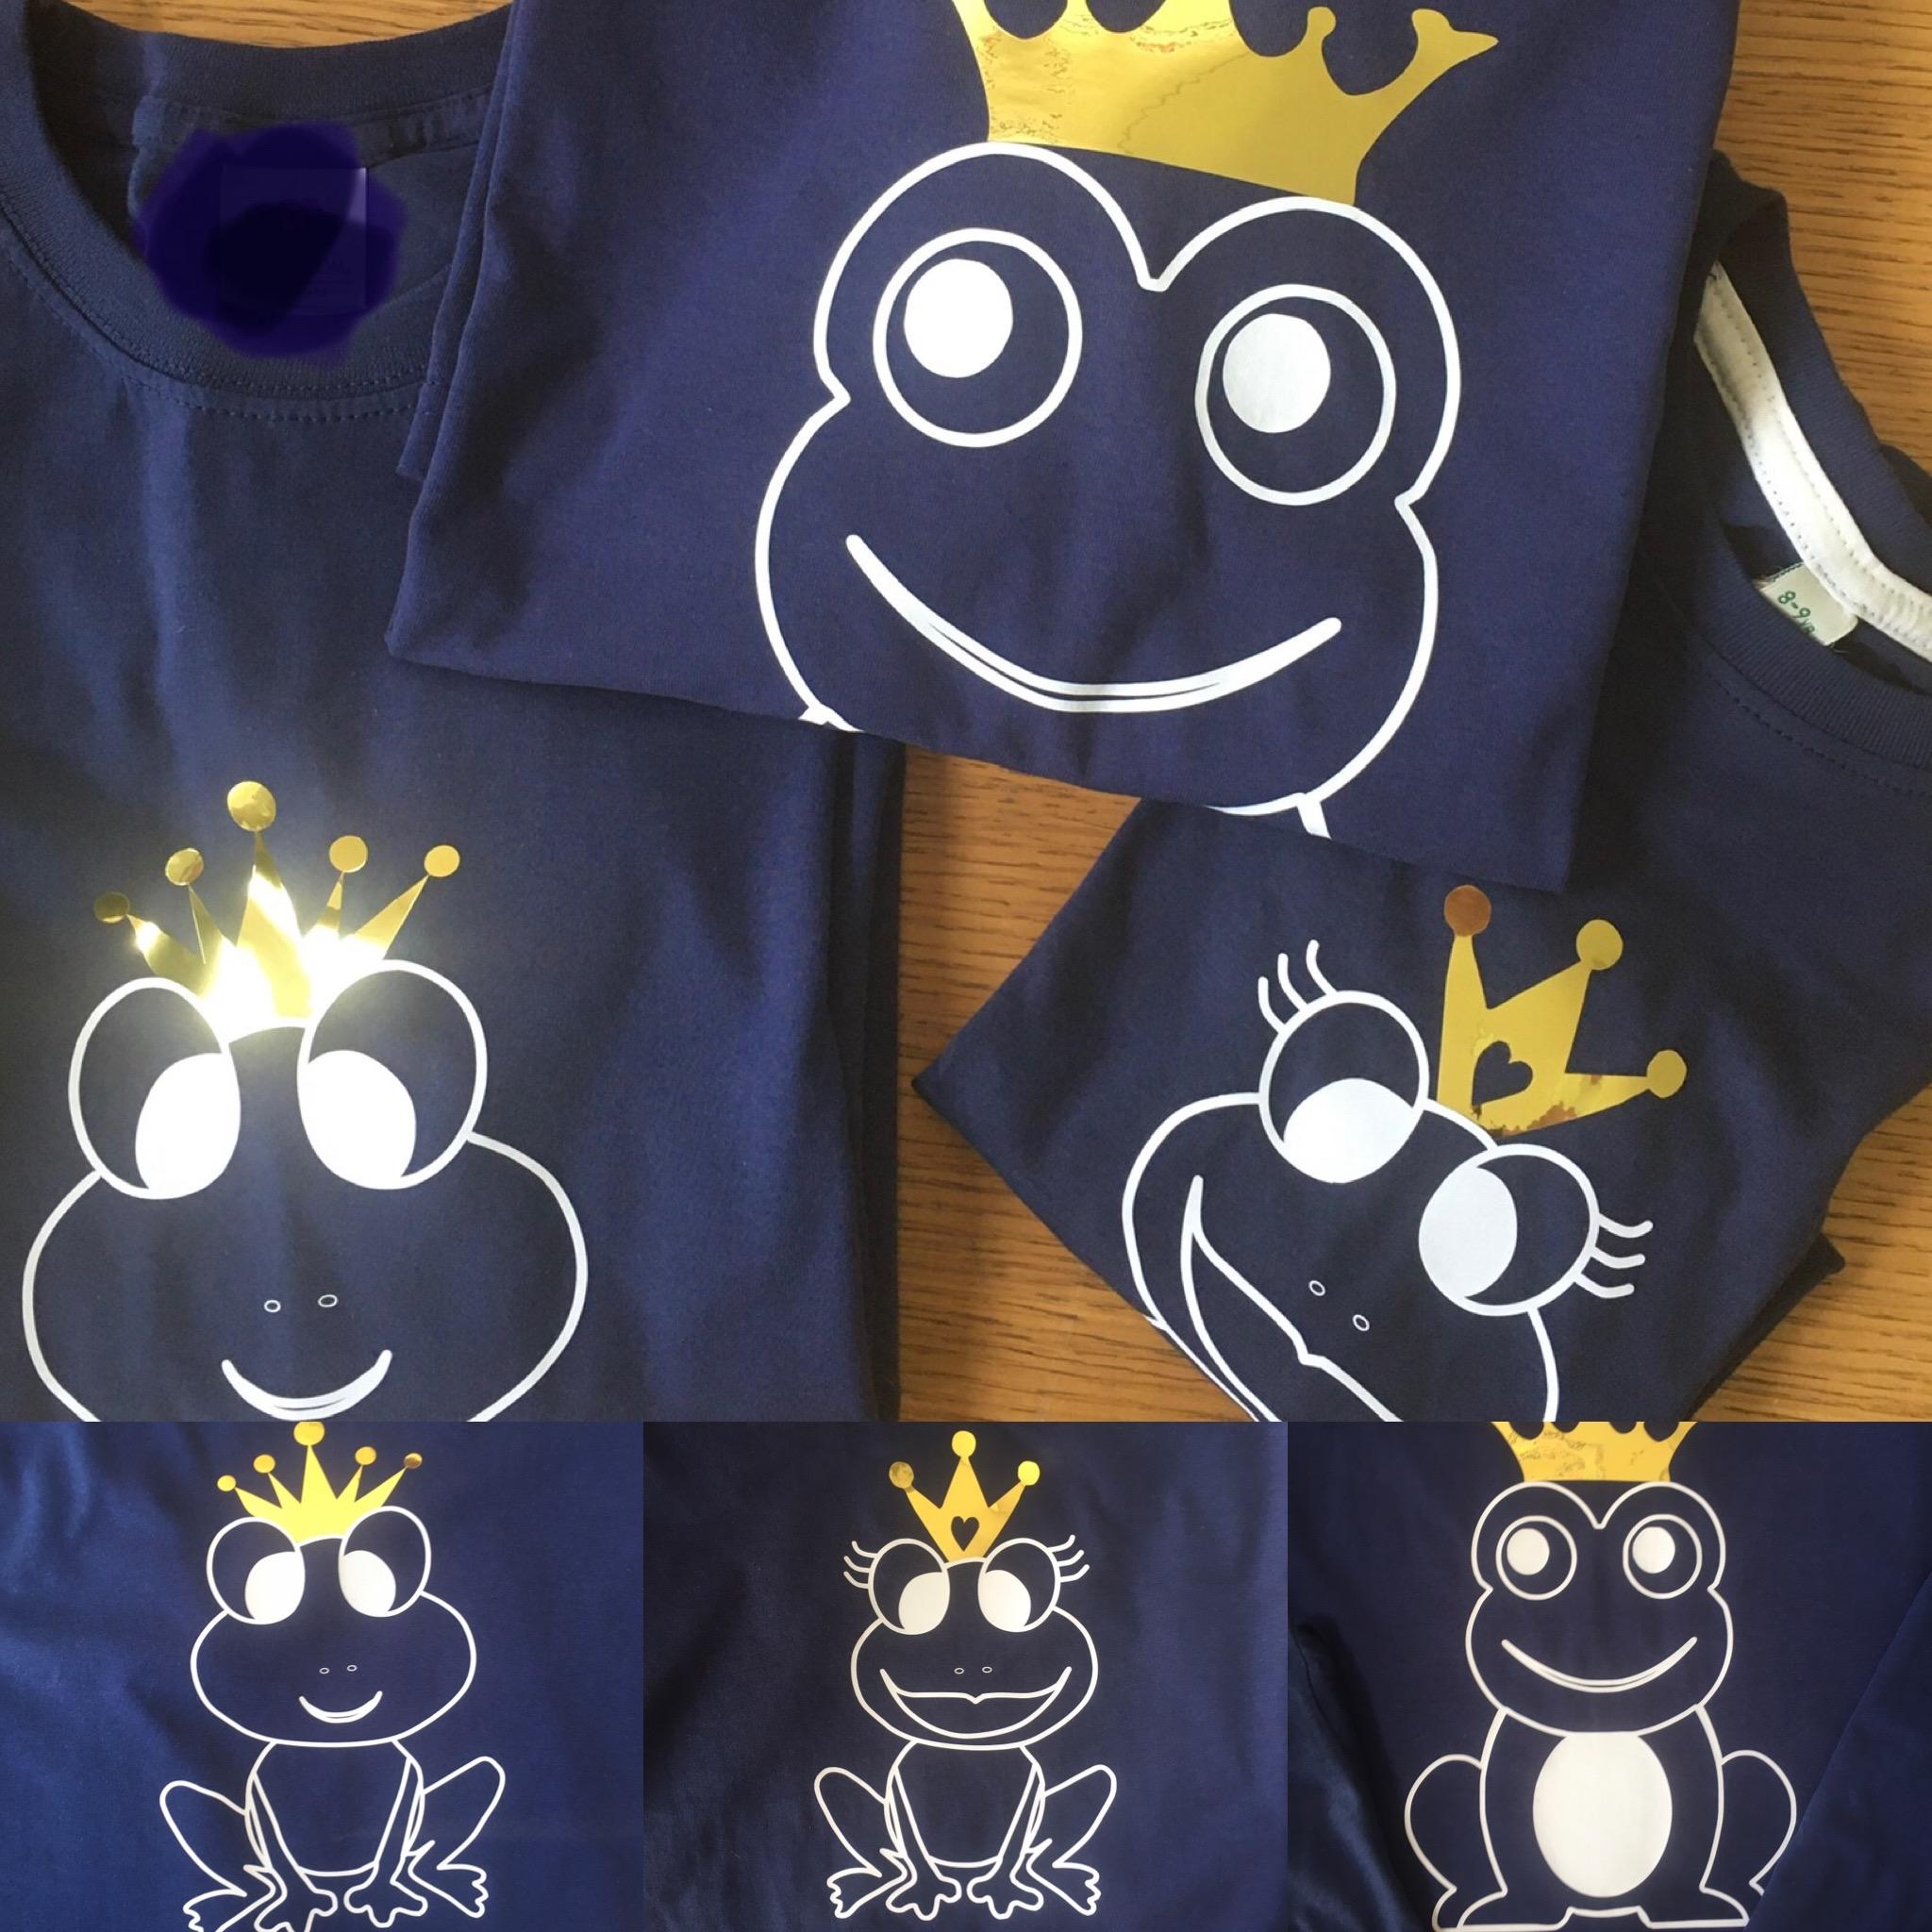 Ensemble tee-shirts personnalisés adulte